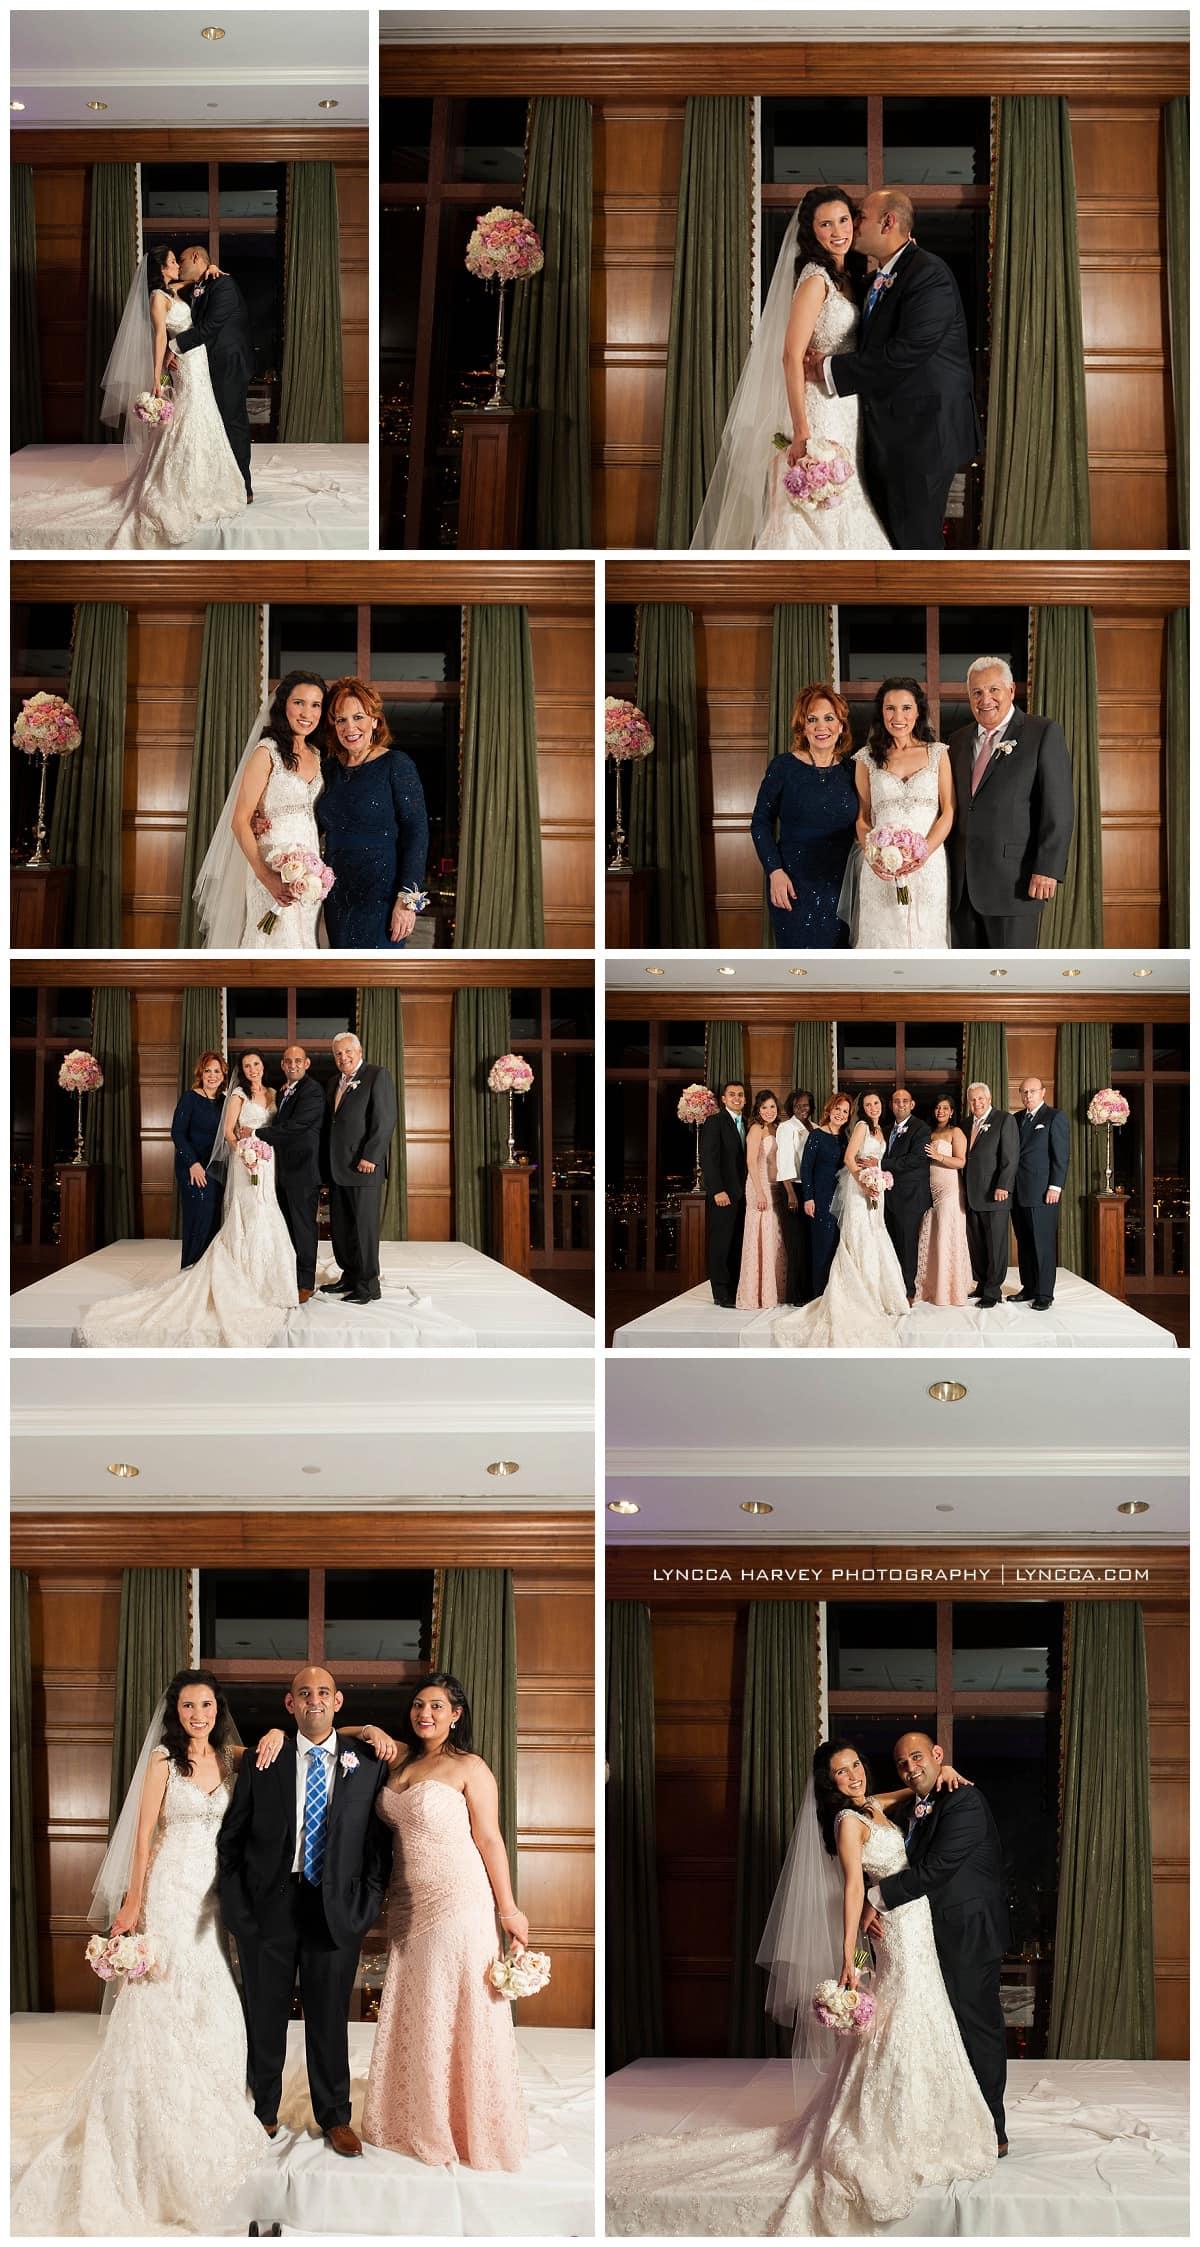 Dallas Wedding Photographer | Cityplace Tower Wedding | Lyncca Harvey Photography